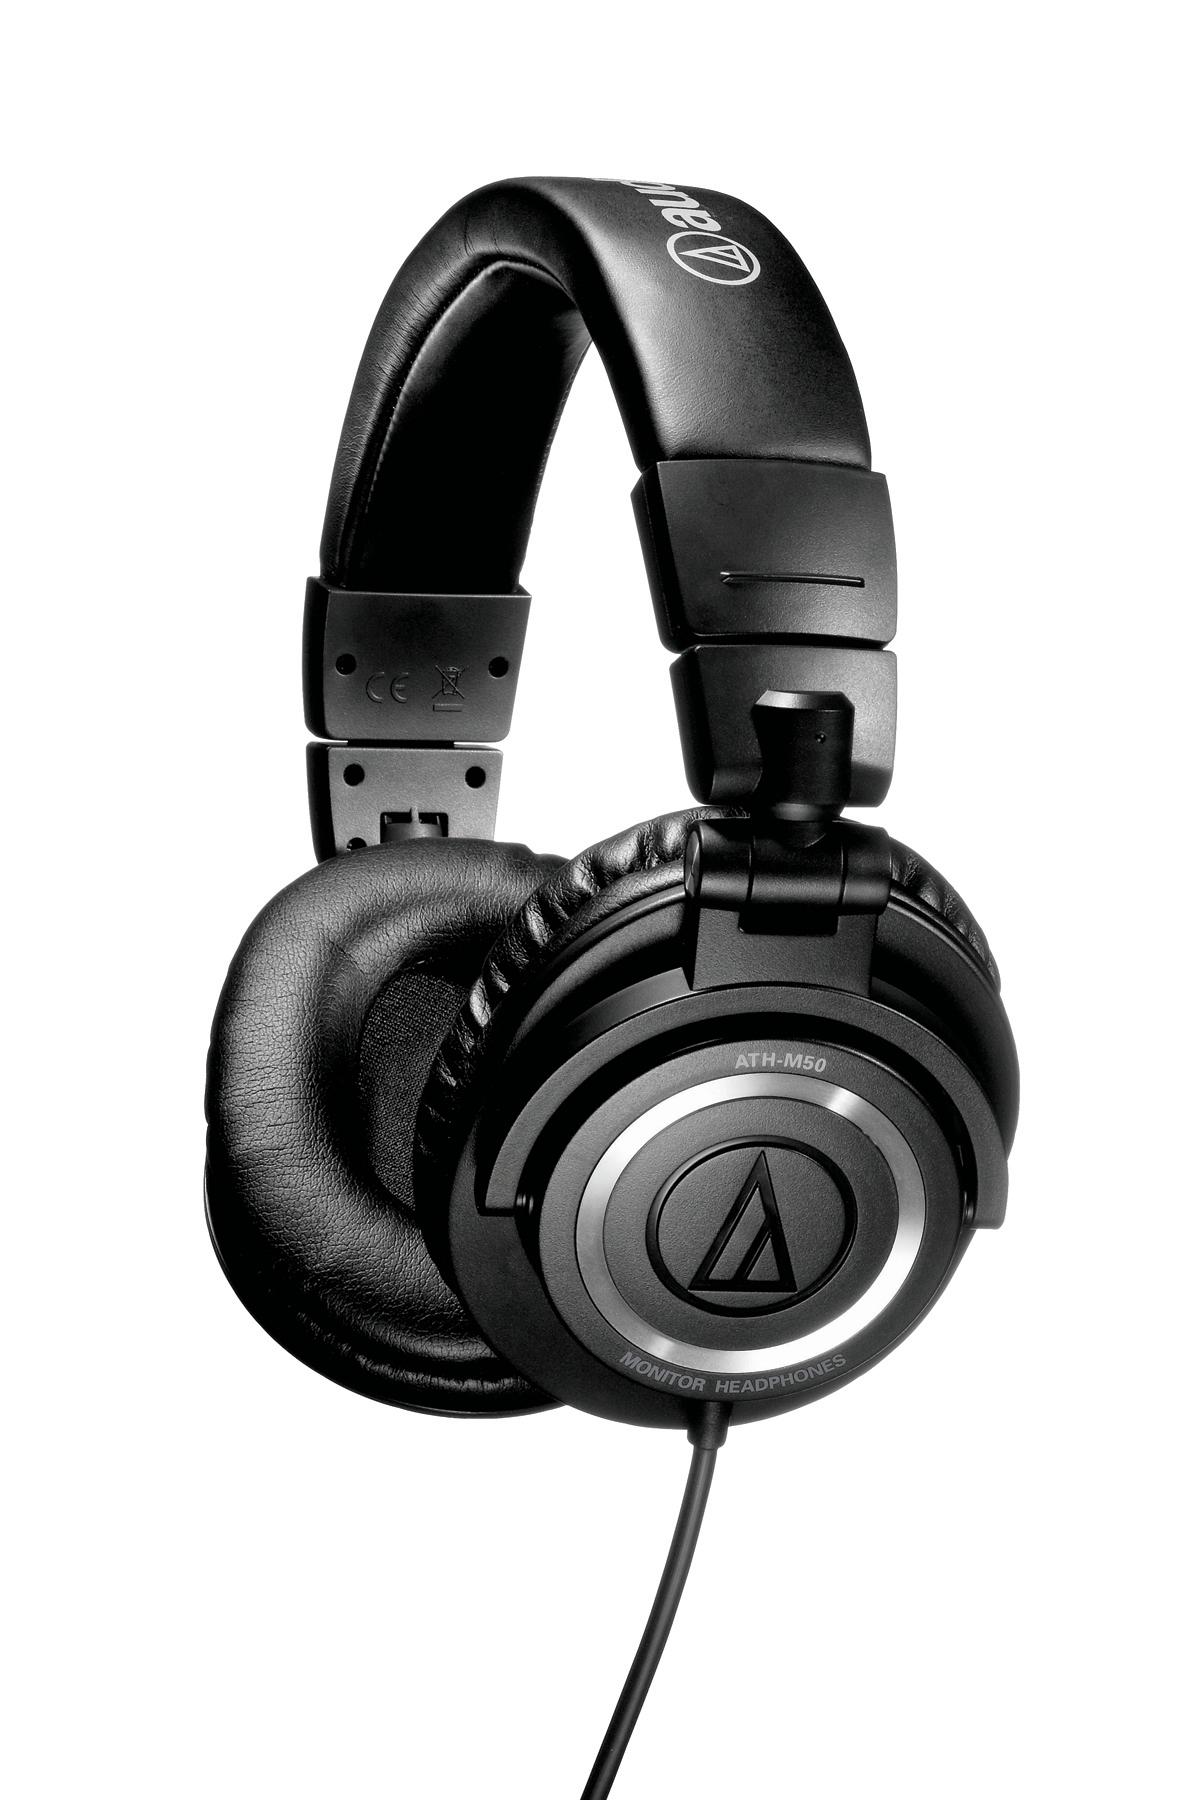 Electronics Irc Archive For 2014 04 15 Hifi Blog Diy Audiophiles Grado Ra1 Headphone Amplifier